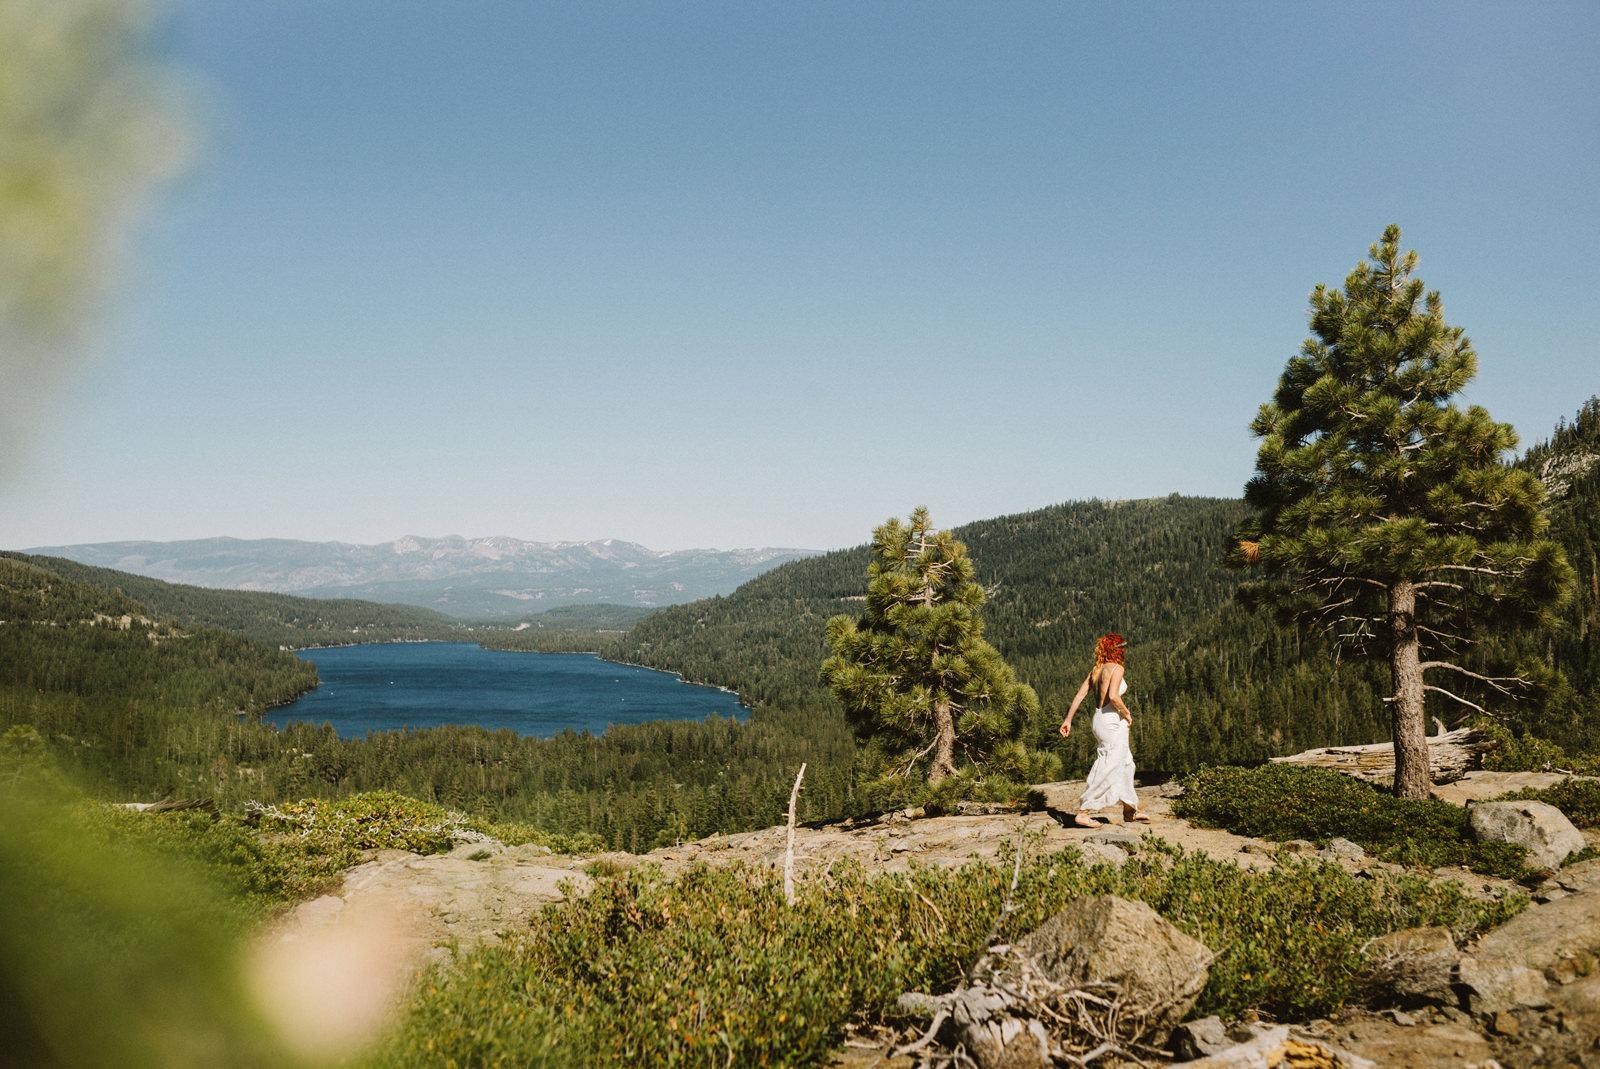 lake-tahoe-elopement-022 LAKE TAHOE ELOPEMENT